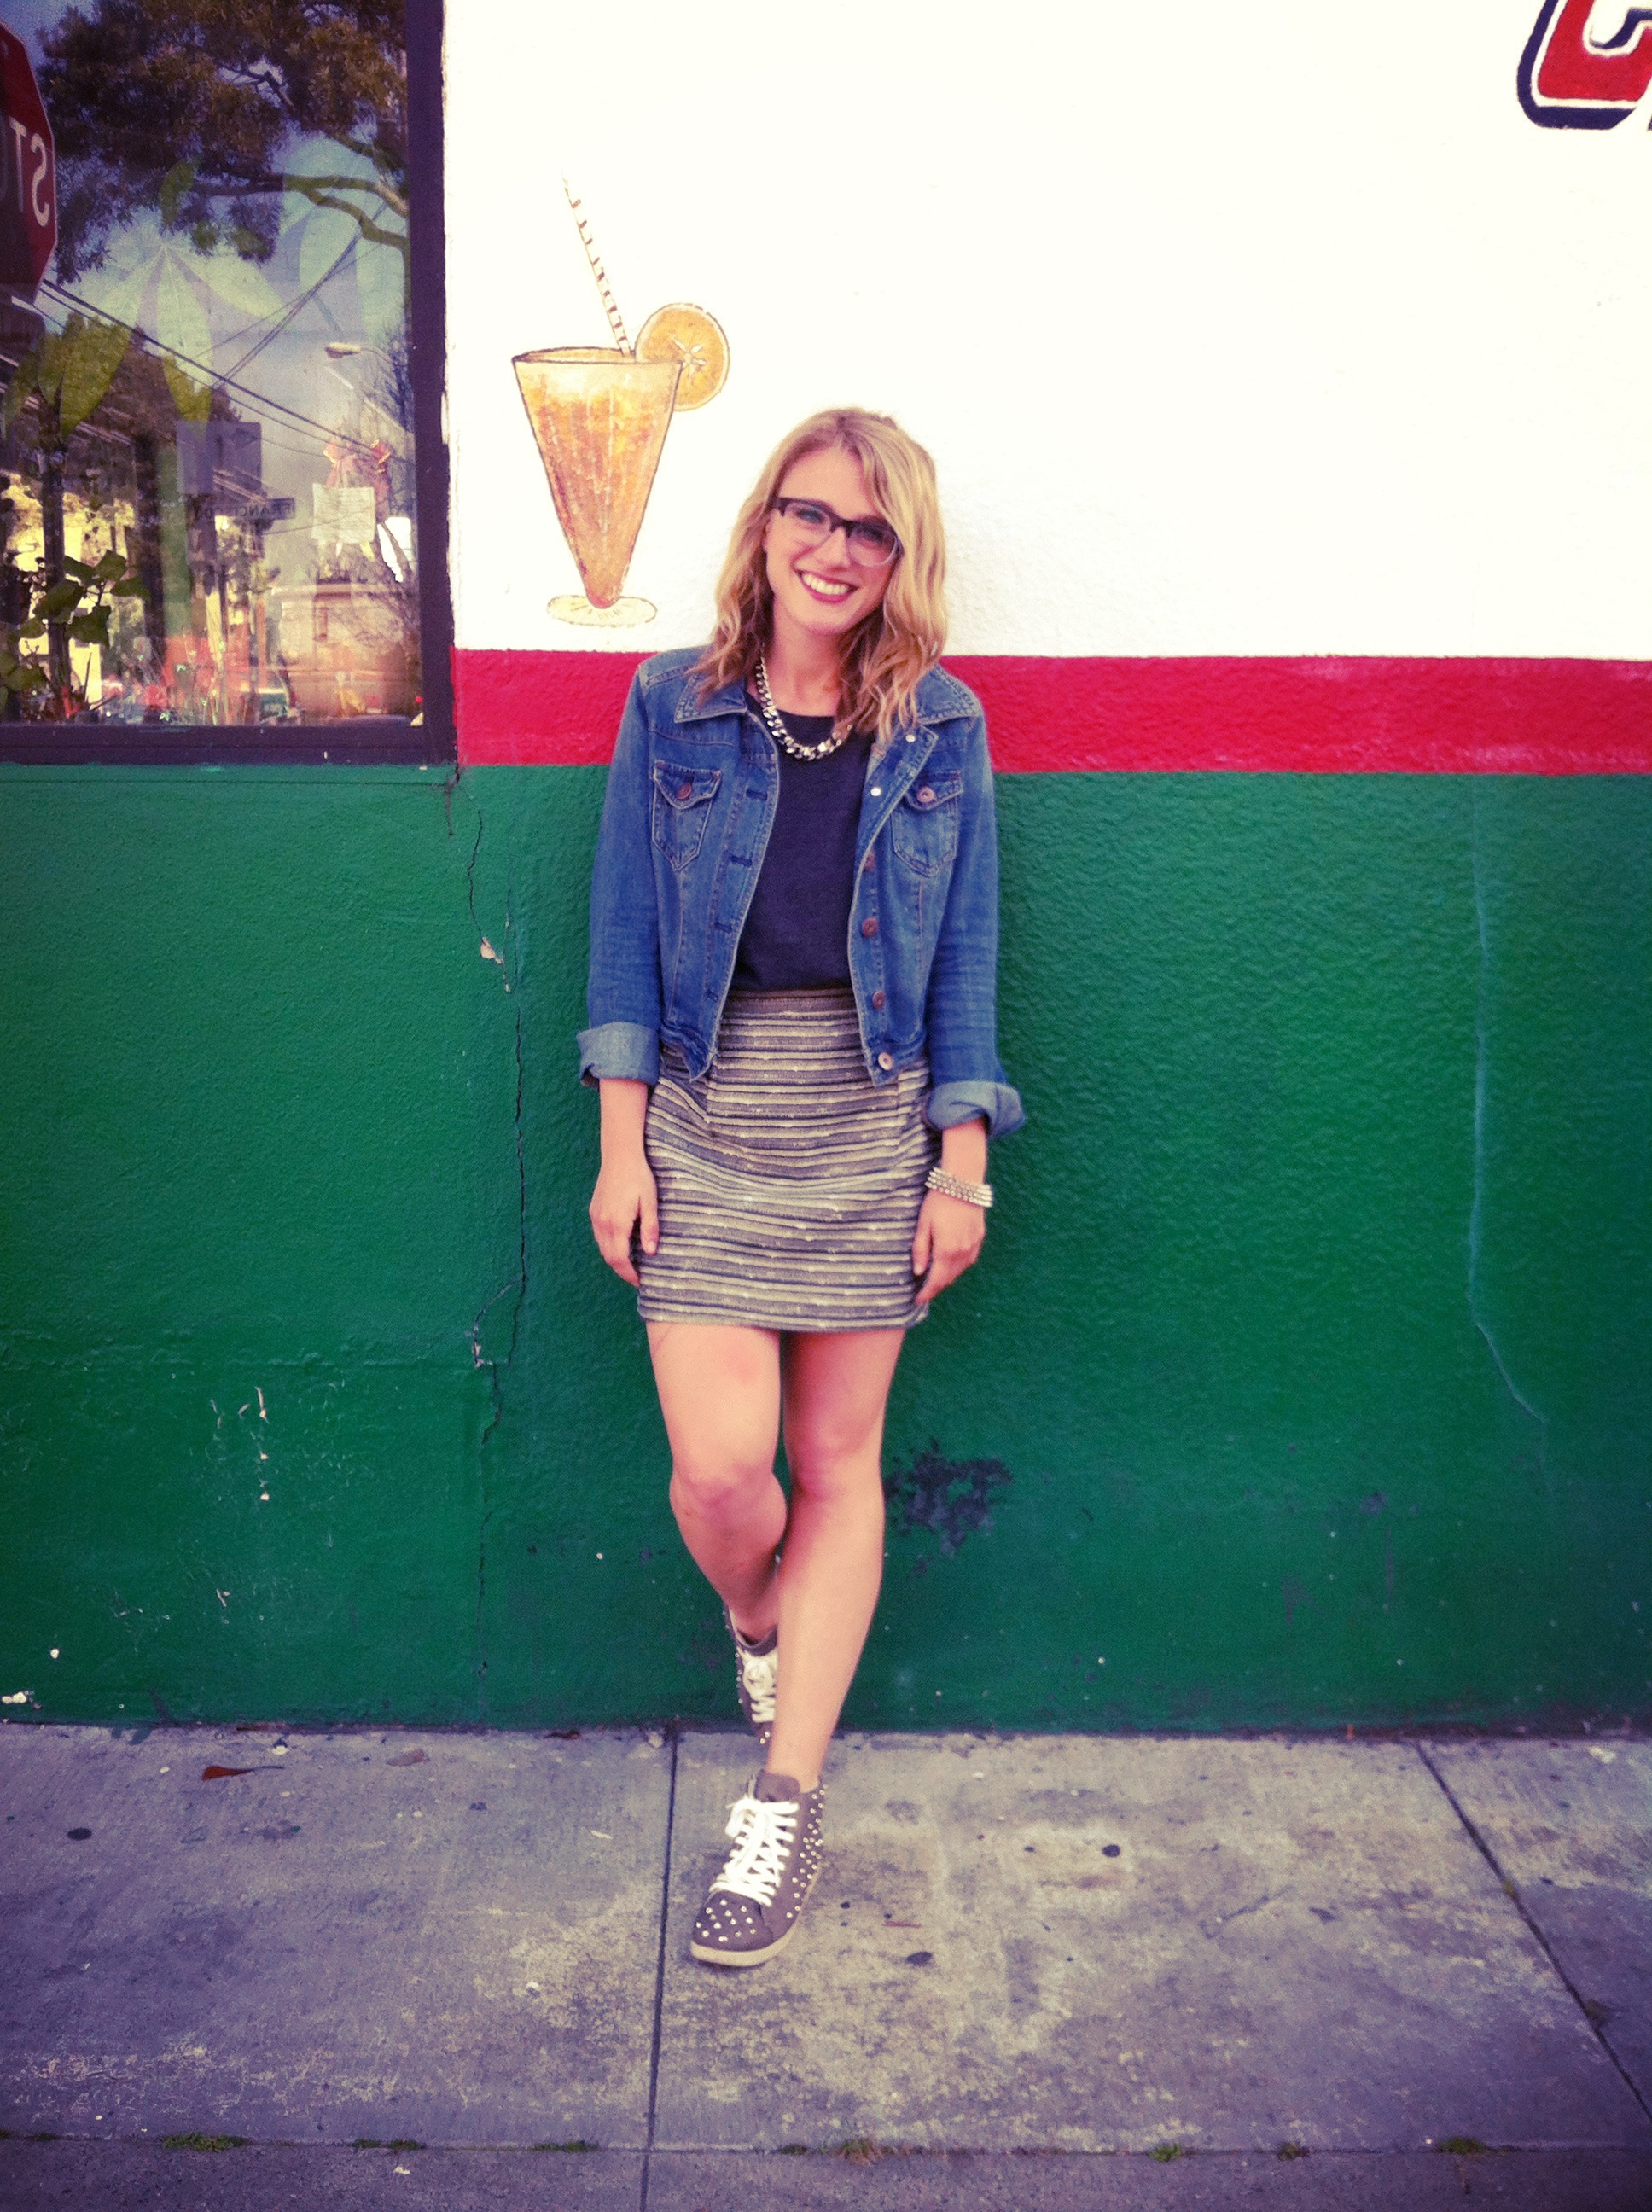 Jacket: Target   Shirt: ON   Skirt: Target   Shoes: Target